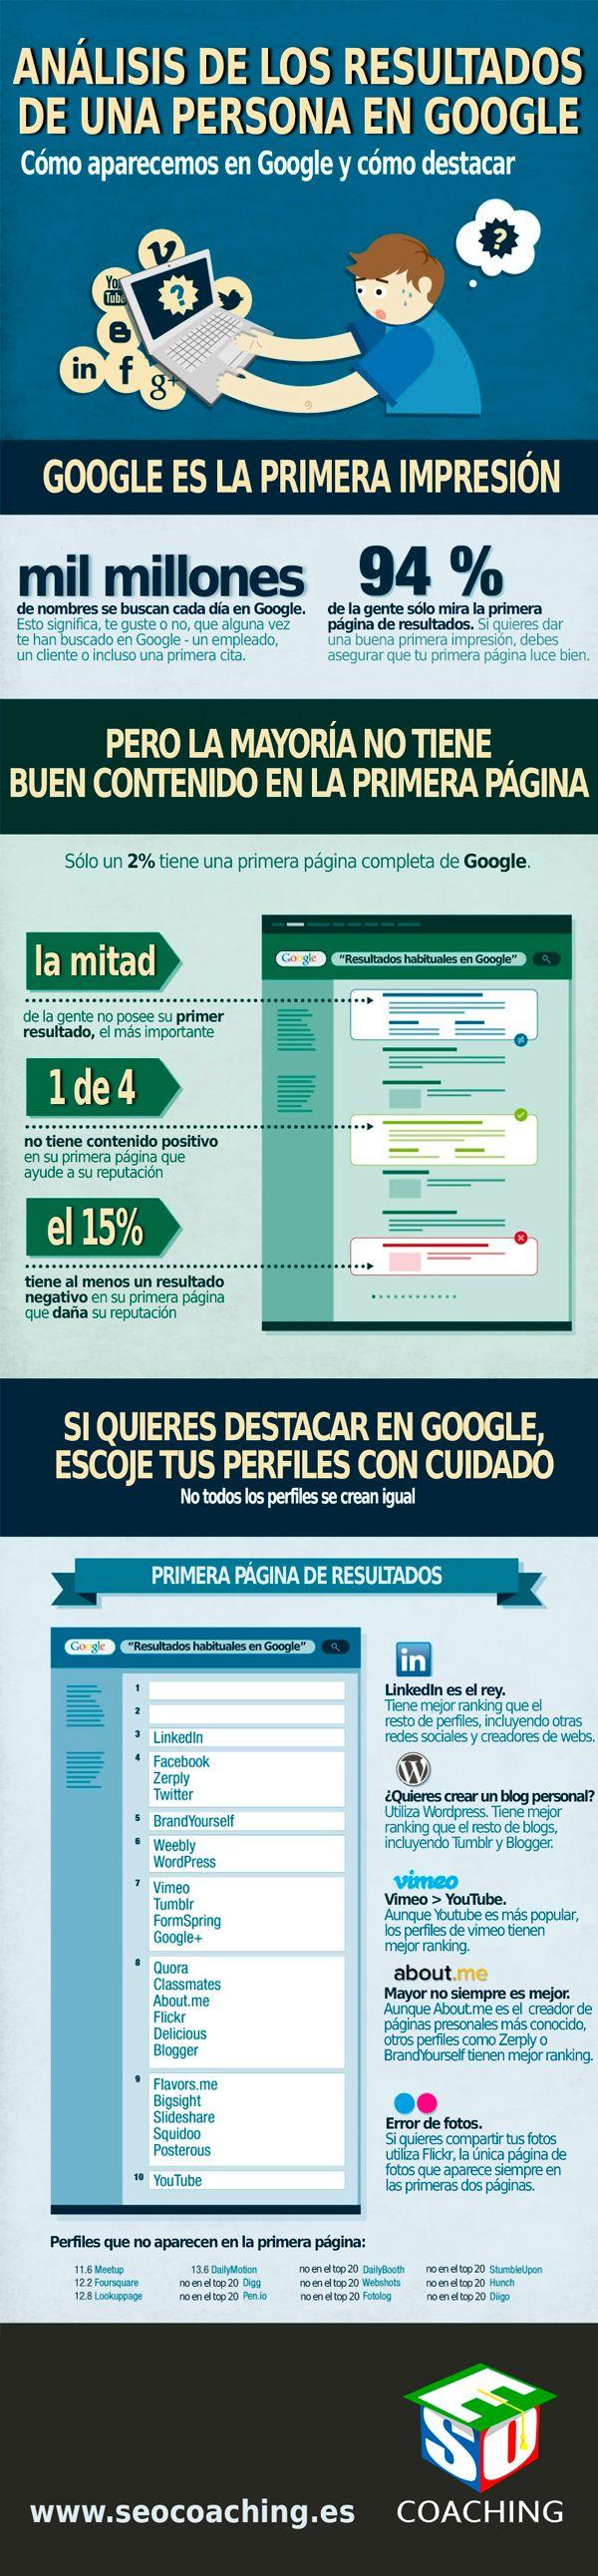 destacar_google